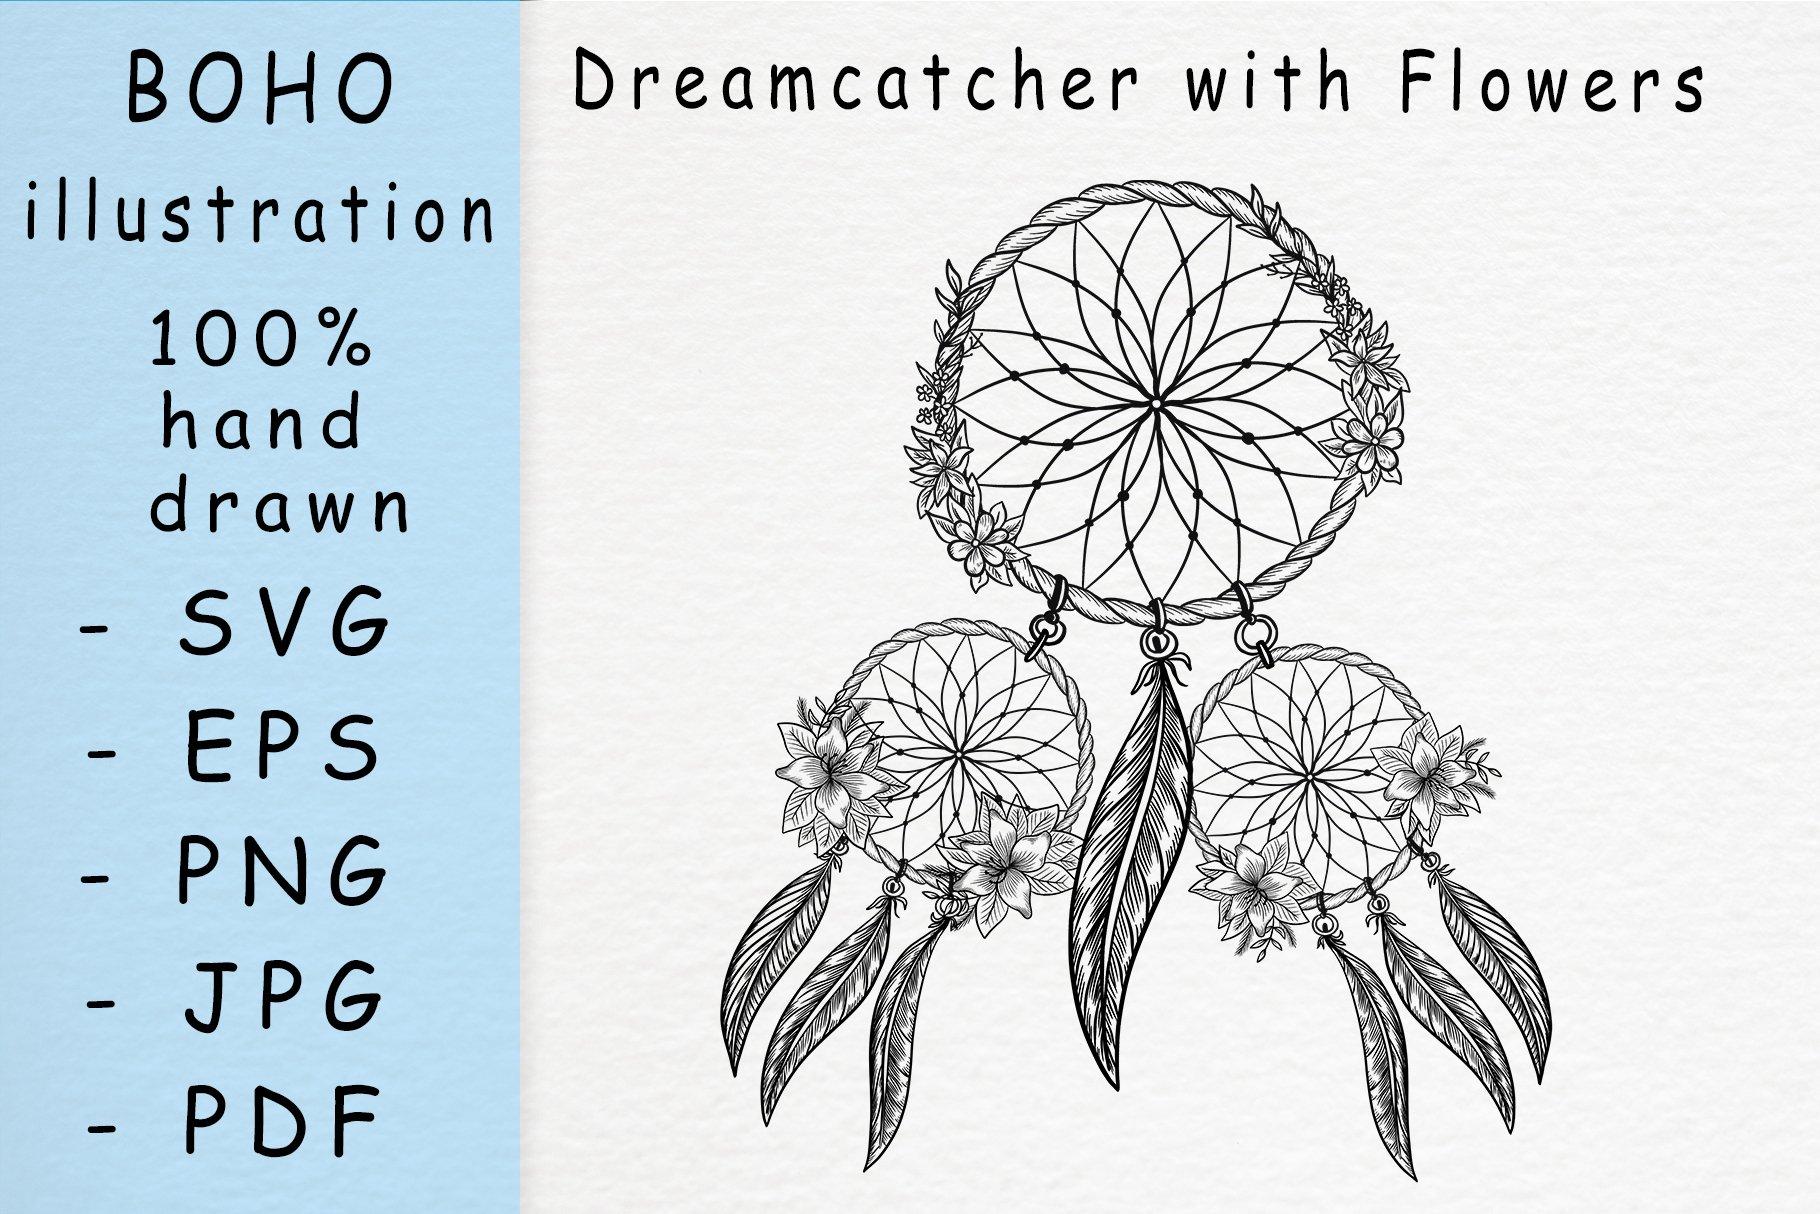 Boho illustration / Dreamcatcher with flowers example image 1